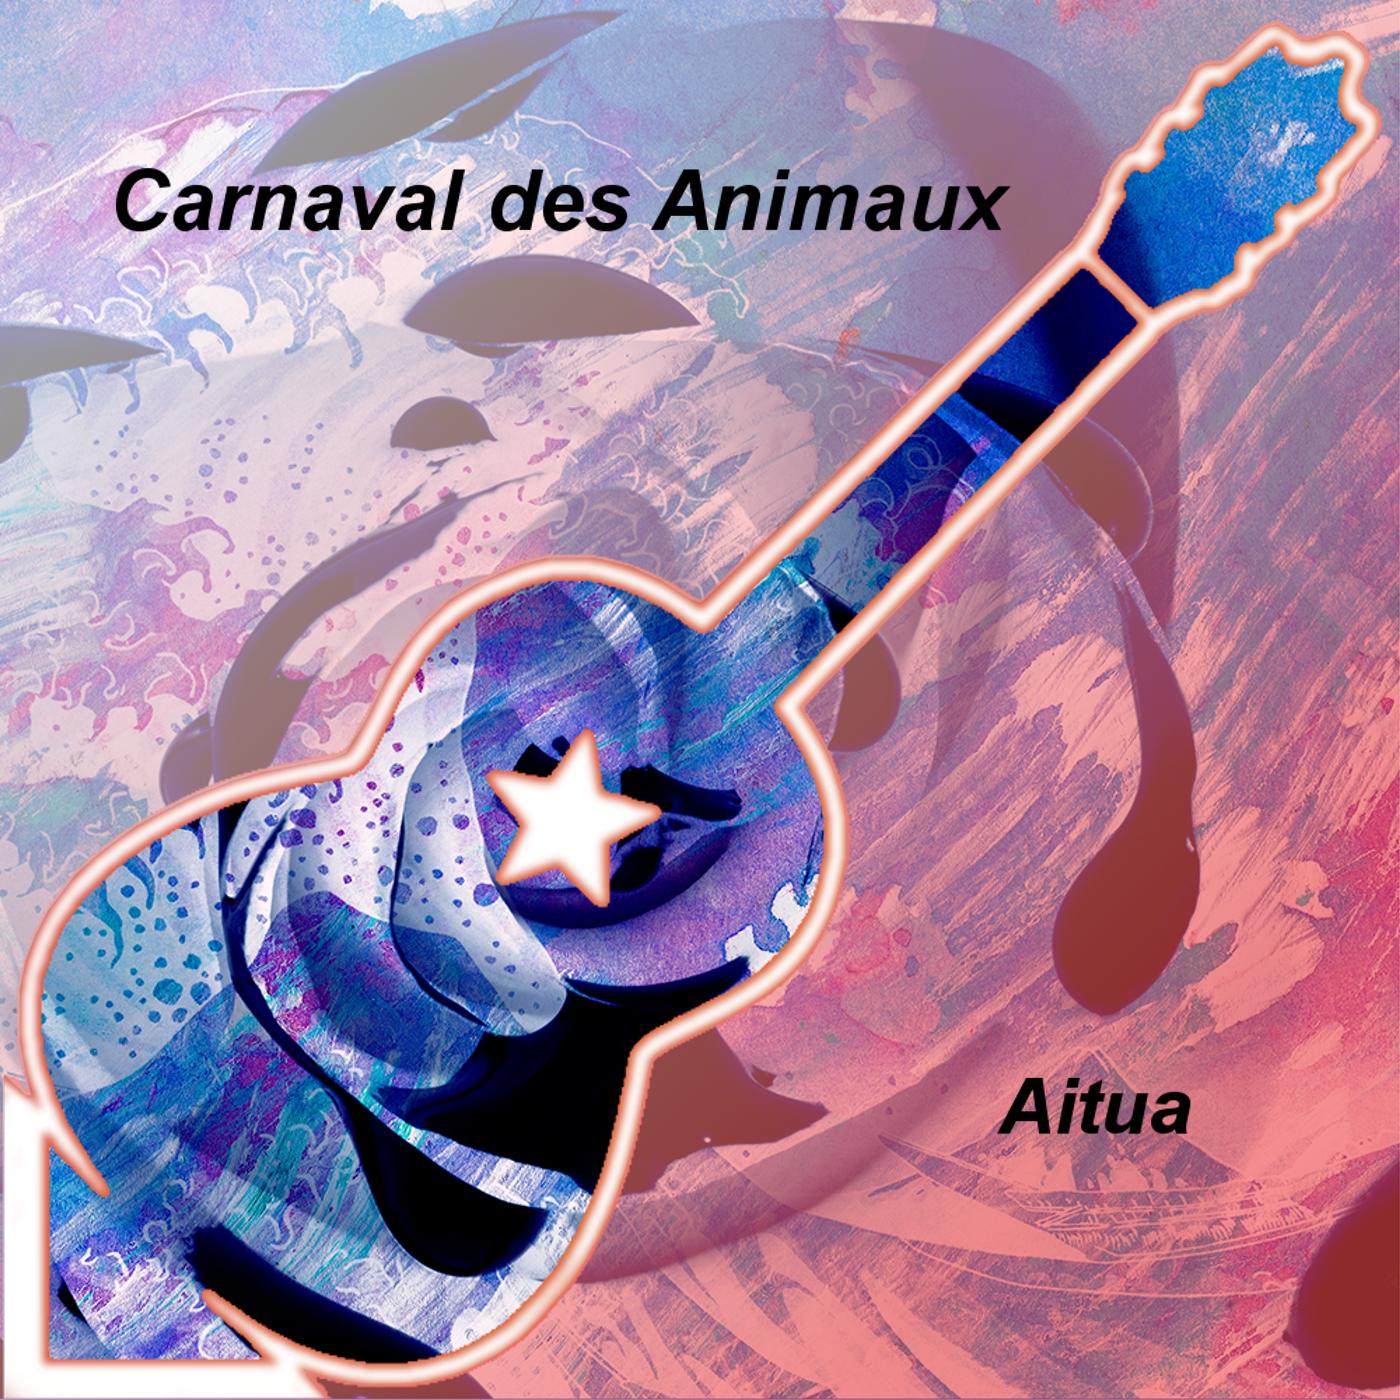 Aitua-Carnaval-des-animaux-bdcp